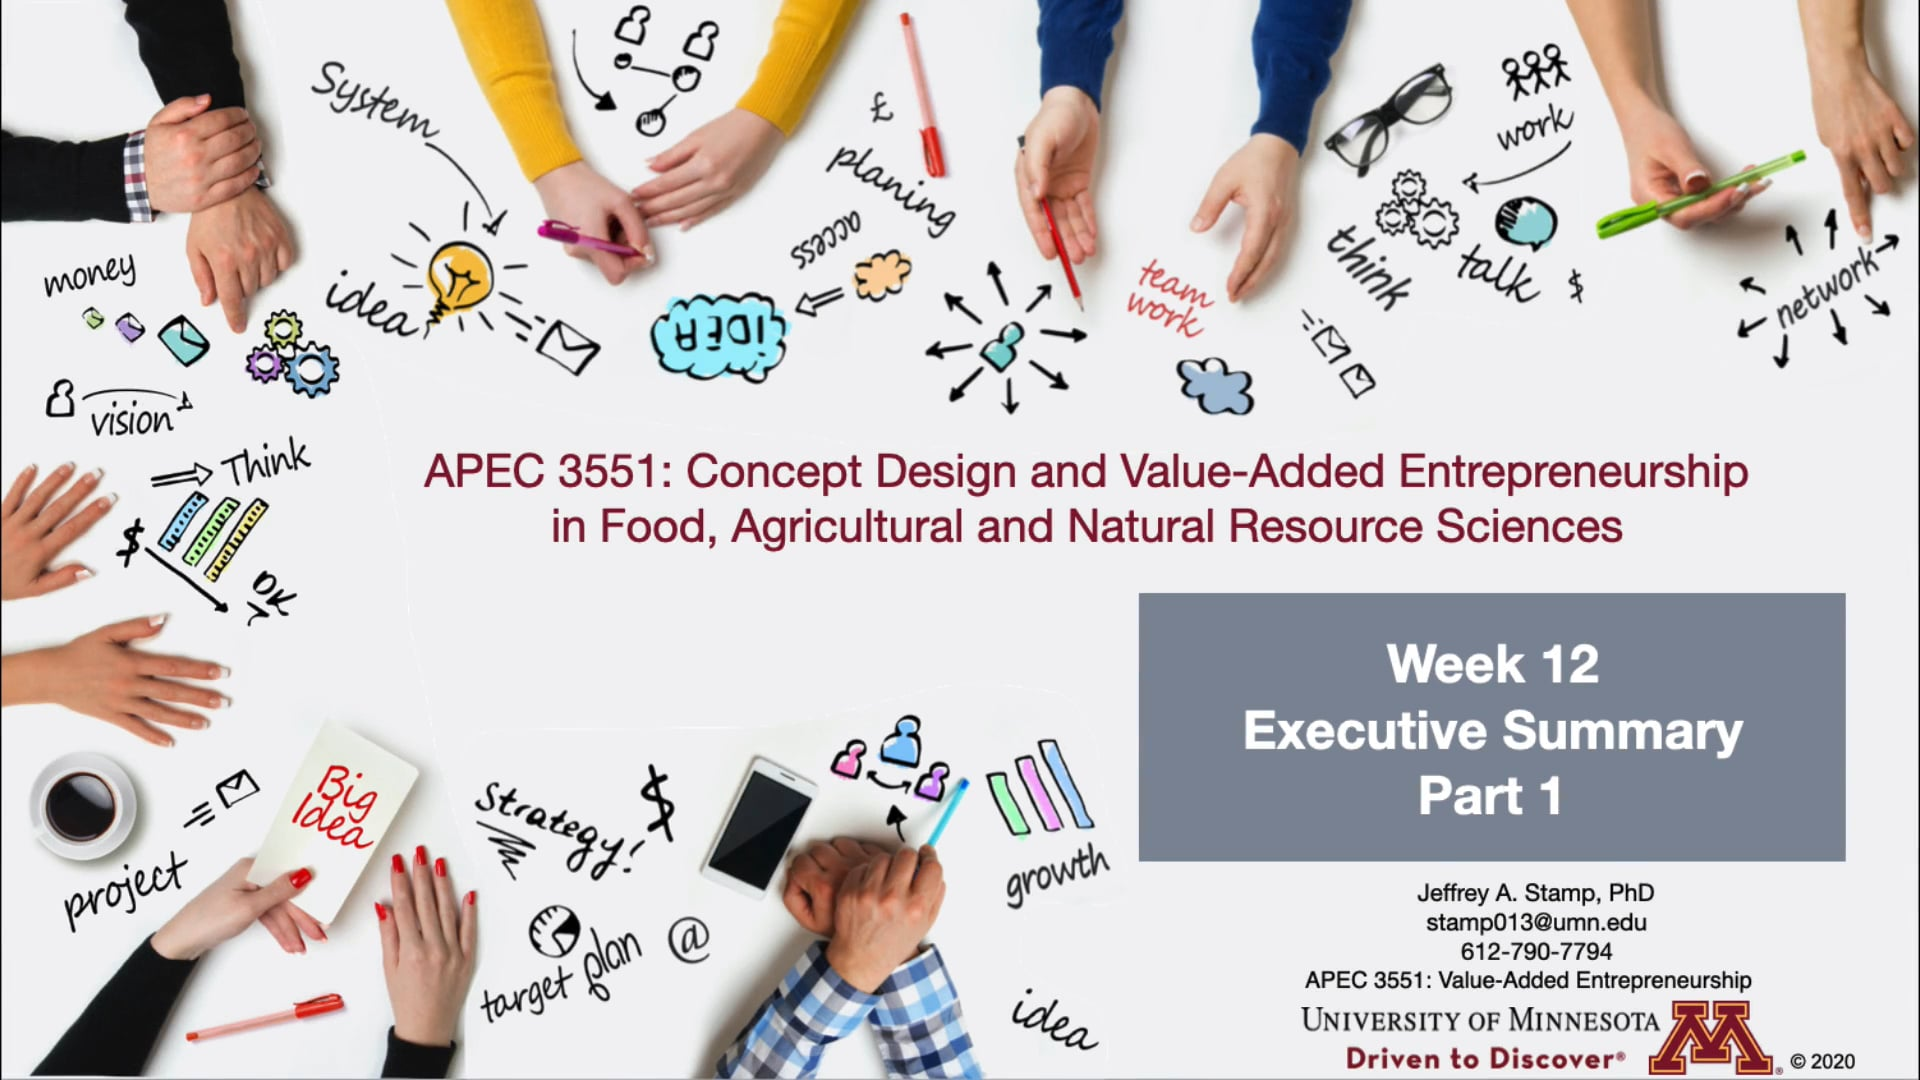 APEC 3551 F20 Week 12 Video 1 Part 1 Executive Summary